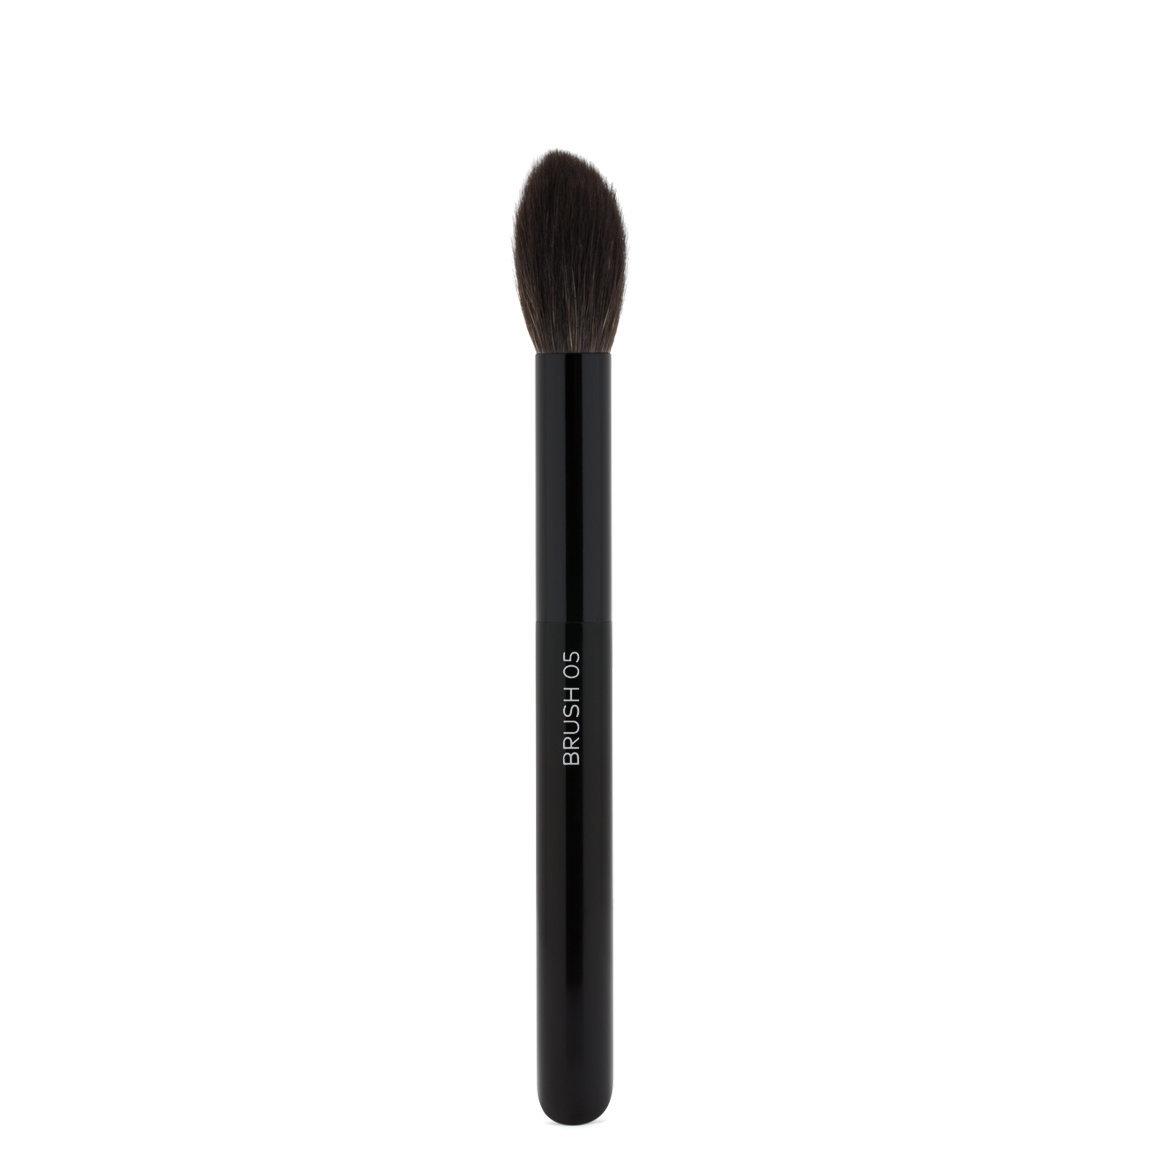 Beautylish Presents Yano Series Brush 05 Small Powder alternative view 1 - product swatch.